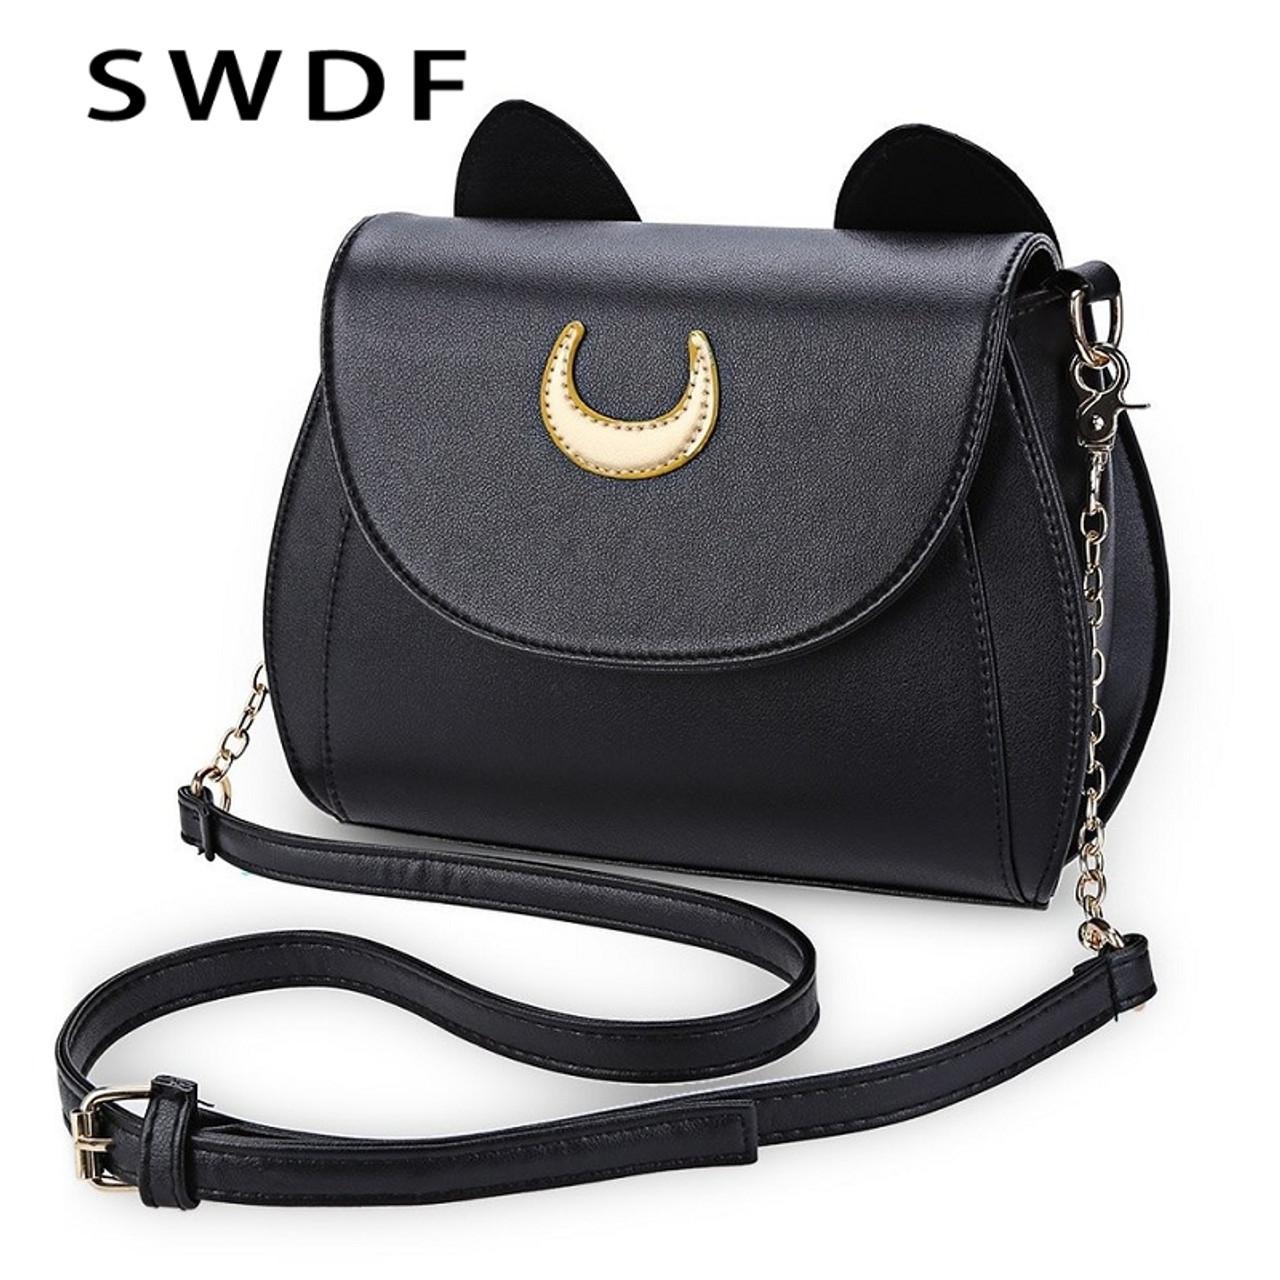 SWDF Summer Sailor Moon Ladies Handbag Black Luna Cat Shape Chain Shoulder  Bag PU Leather Women ... 2fa77a0e7915f